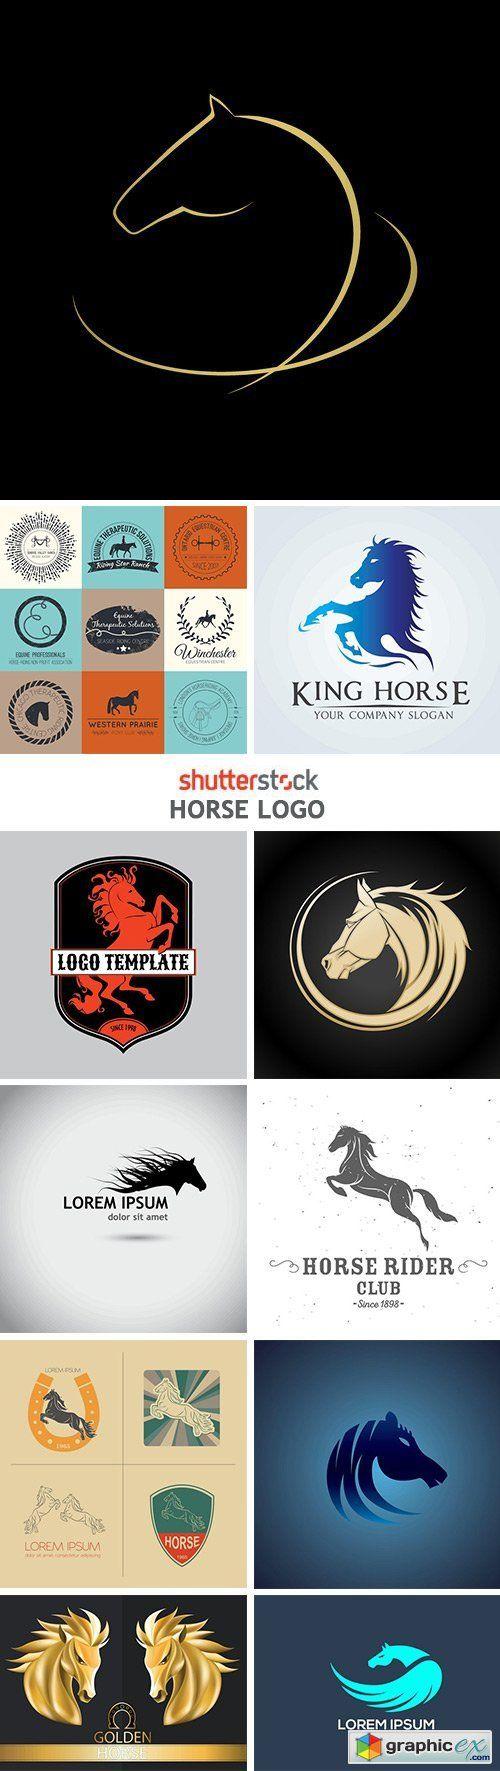 Horse Logo - 25xEPS                                                                                                                                                     More